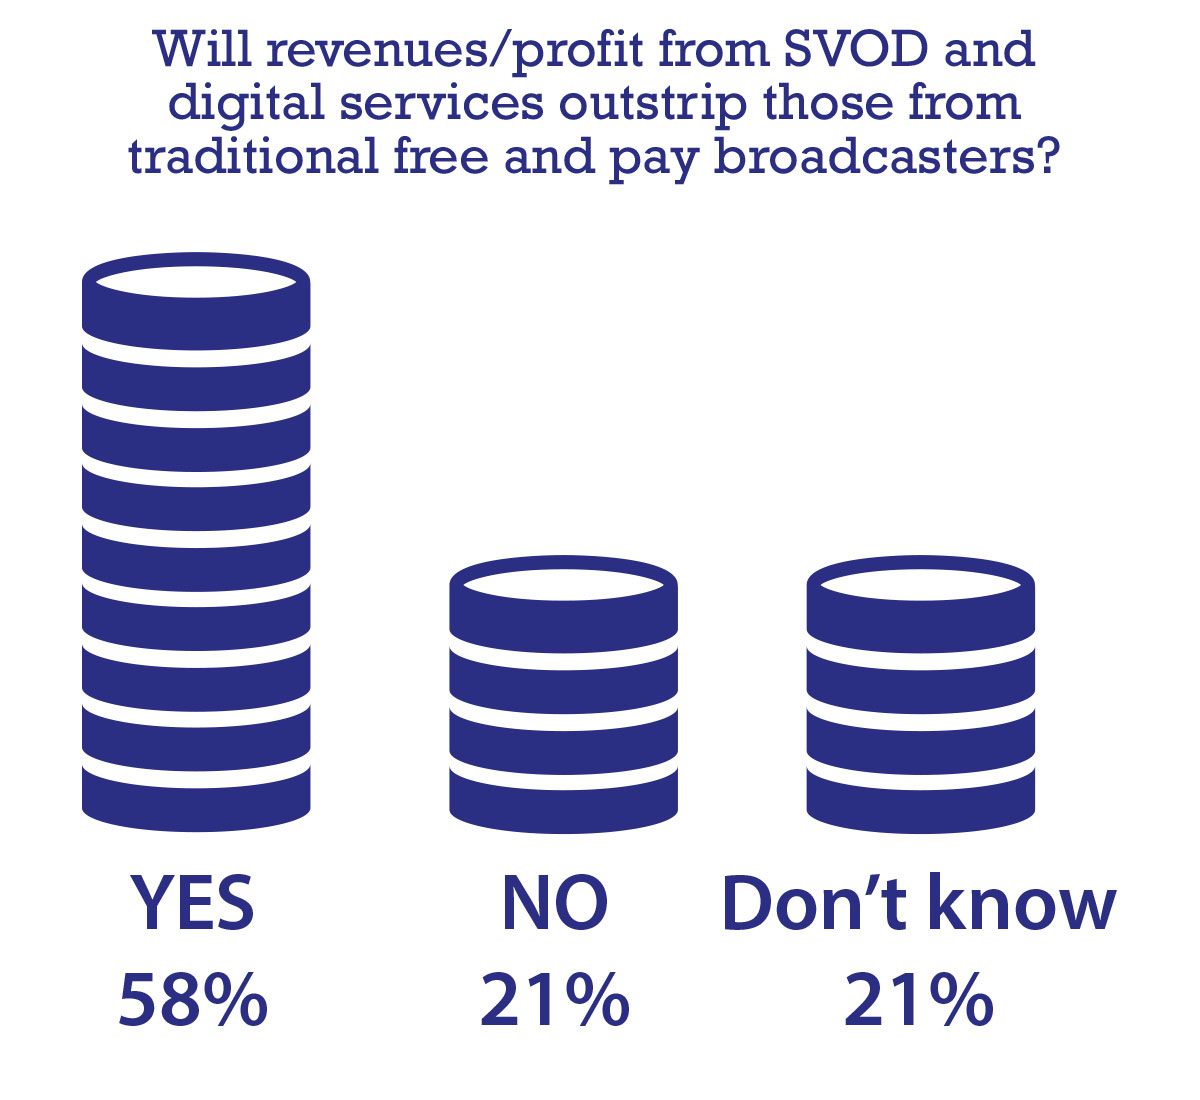 SVOD_revenues